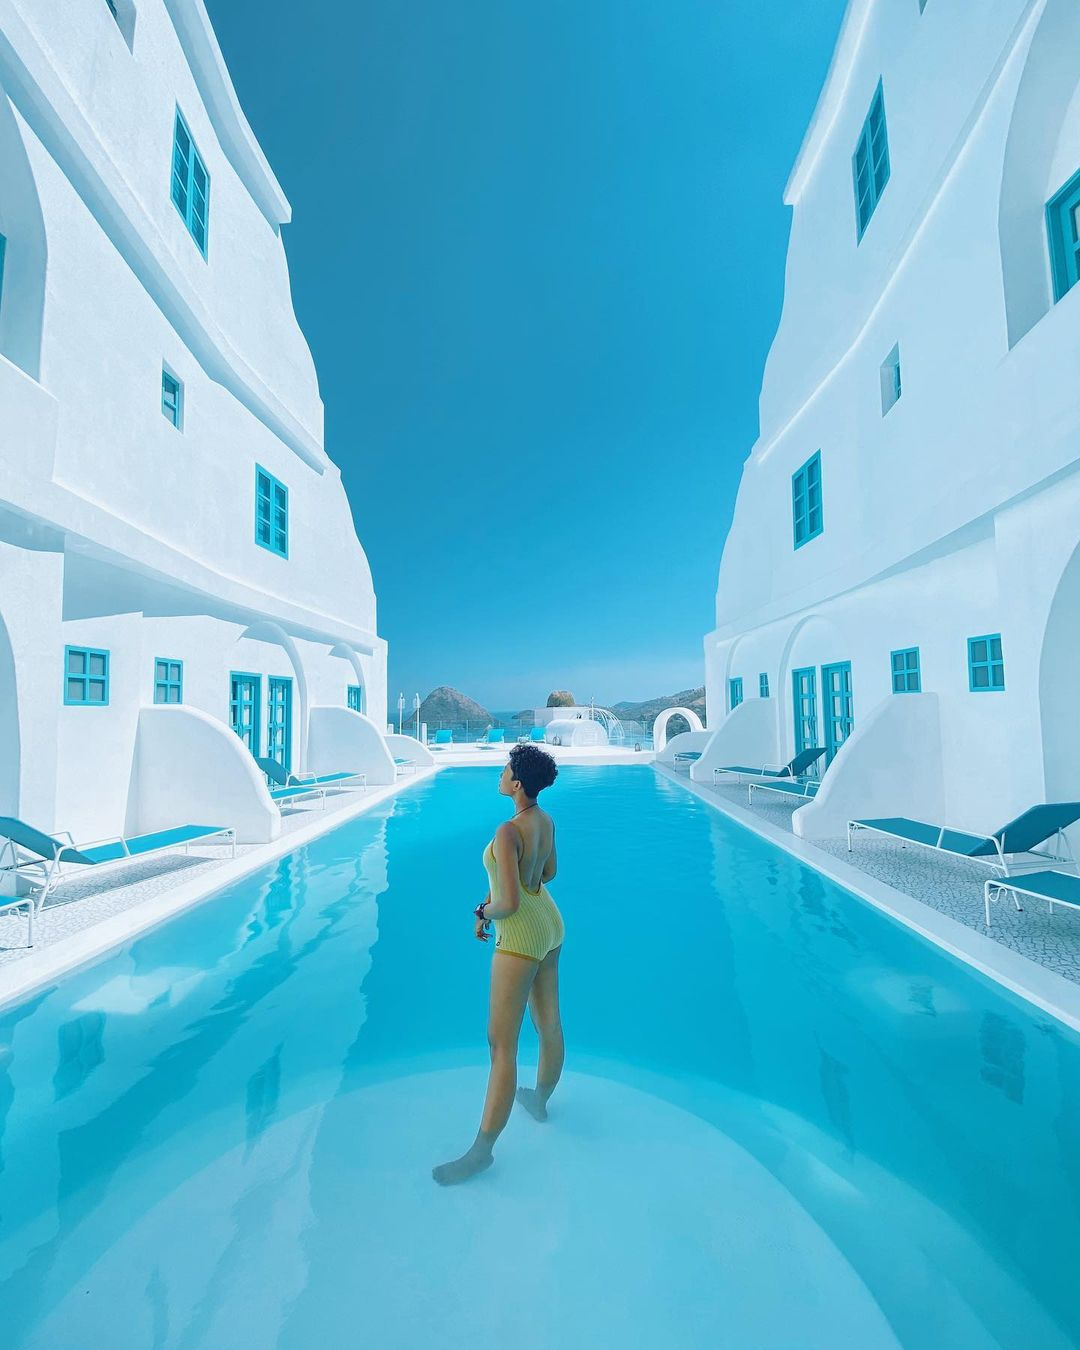 Kolam Renang Yang Diapi 2 Bangunan Di Loccal Collection Hotel Labuan Bajo Image From @rivanibistolen